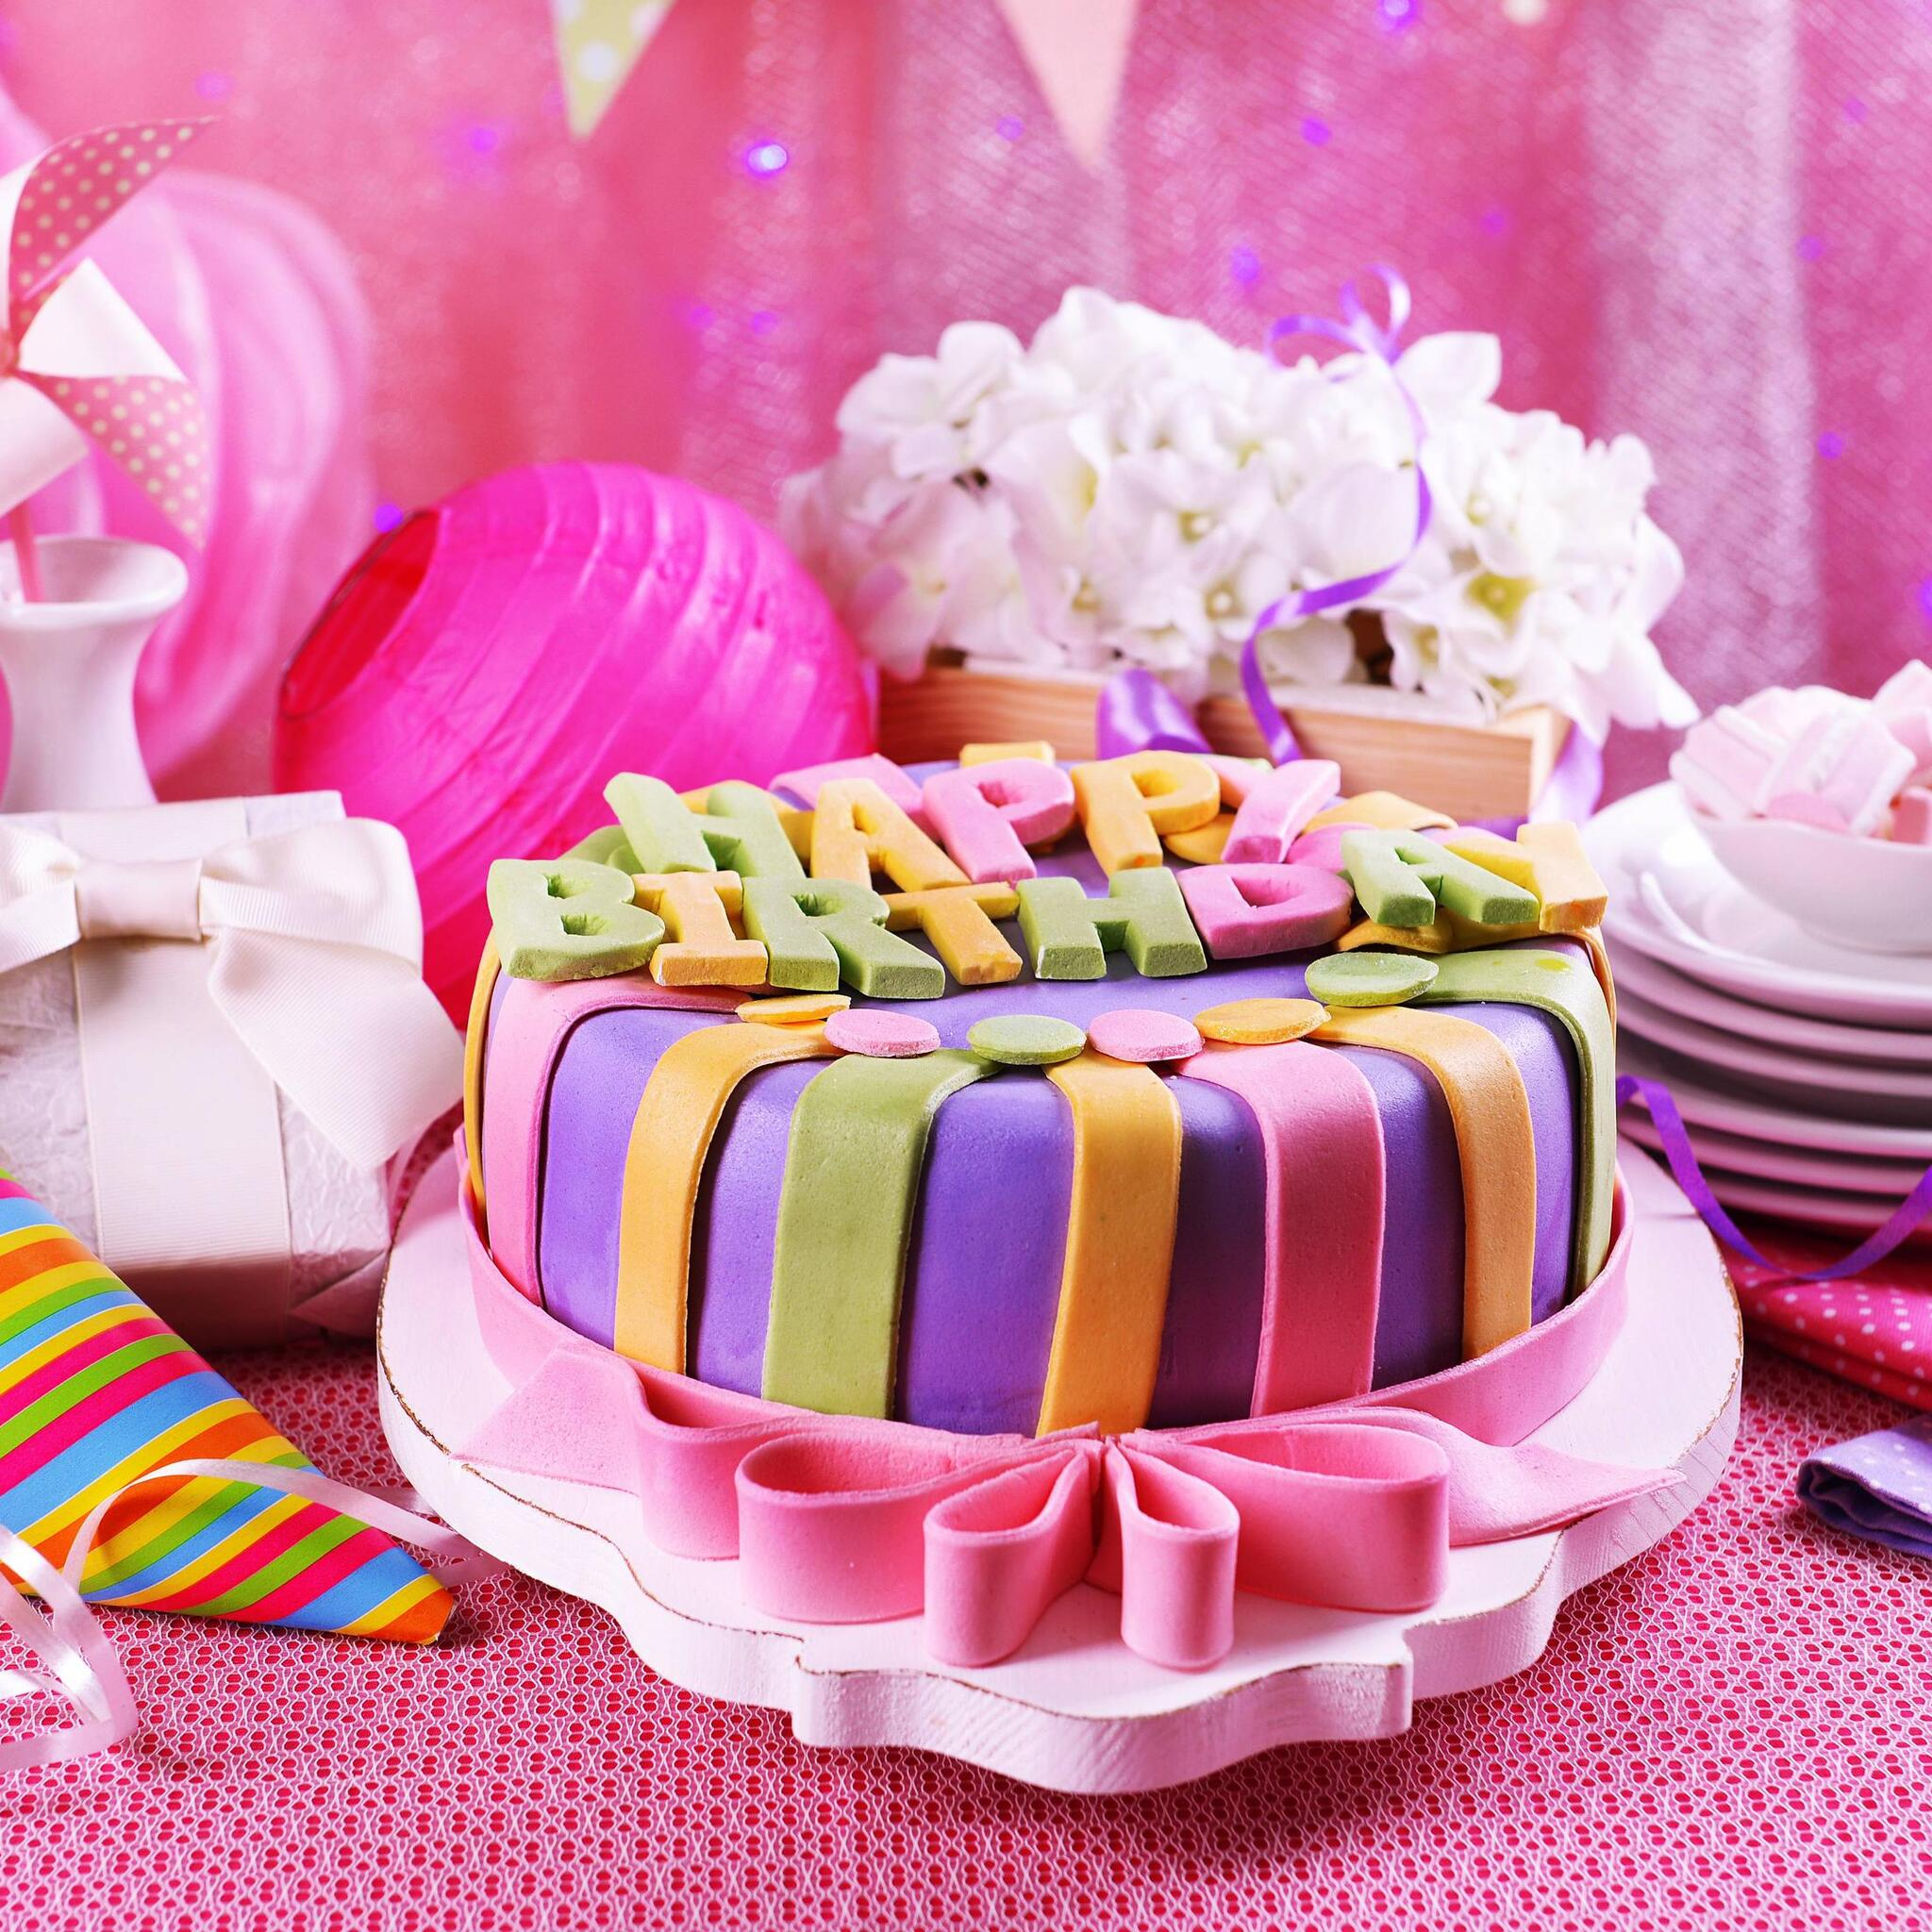 pink-birthday-cake-hd.jpg